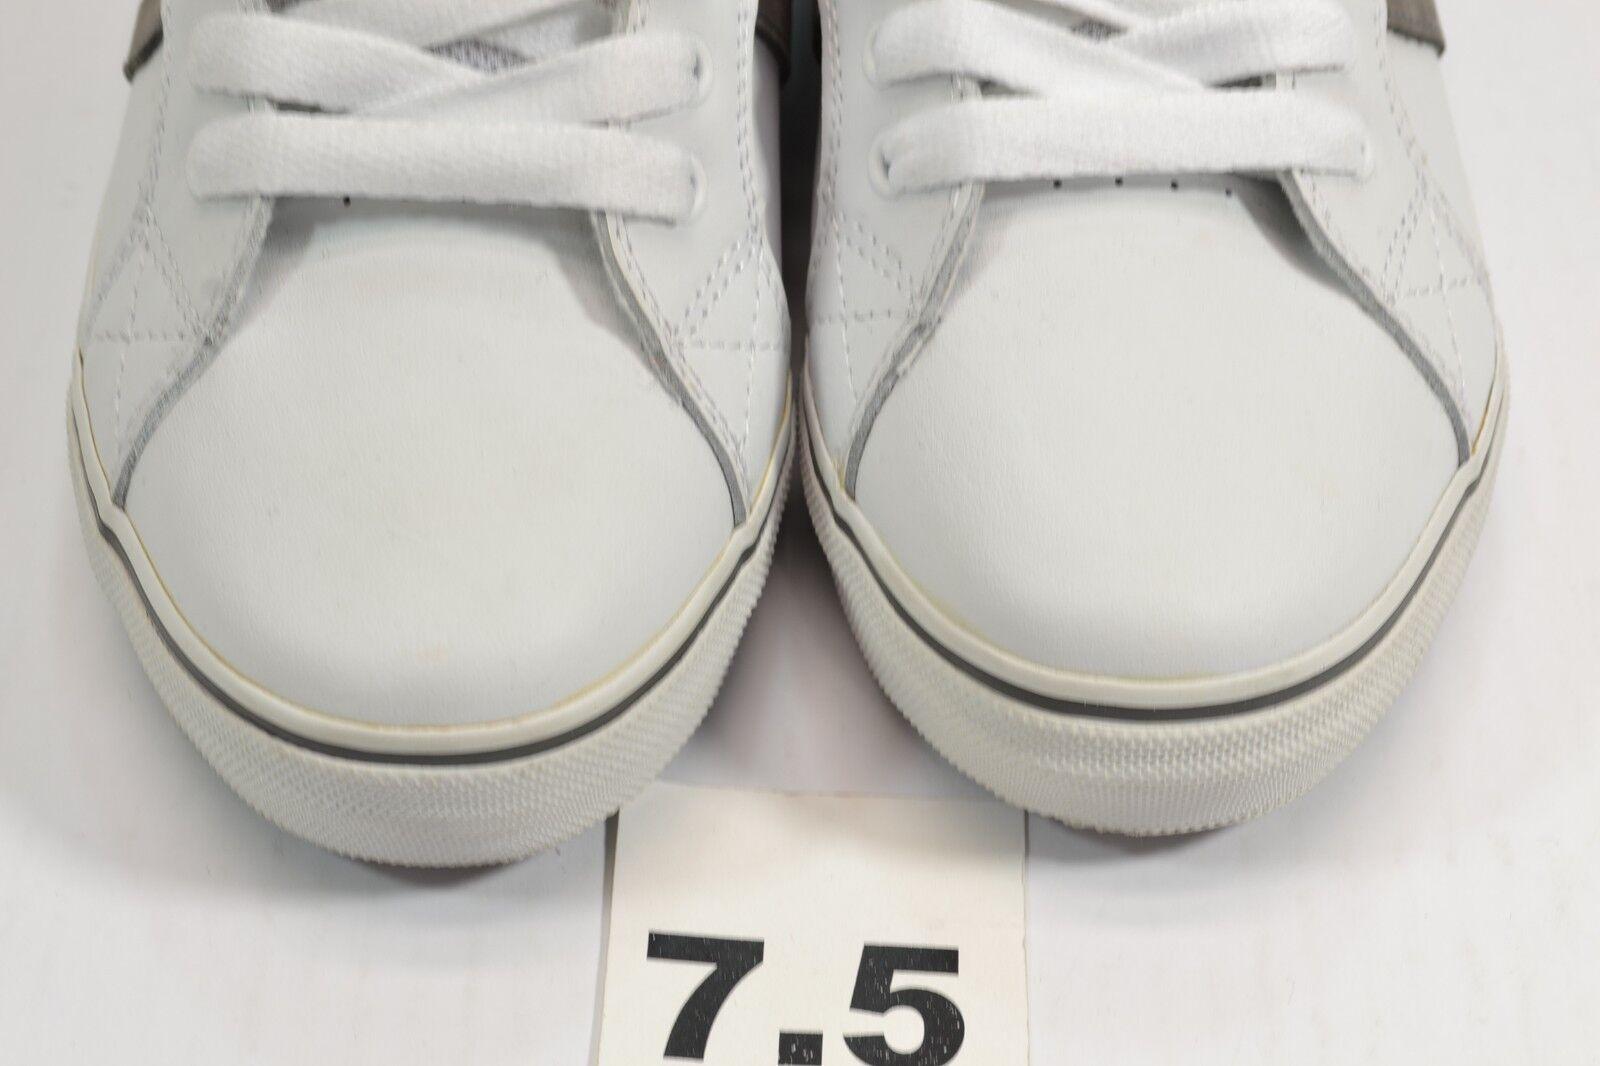 a51d6063f32 ... Lakai MJ2 SELECT White Grey Grey Grey Leather Skatebording Discounted  (110) Men s Shoes 57cb45 ...